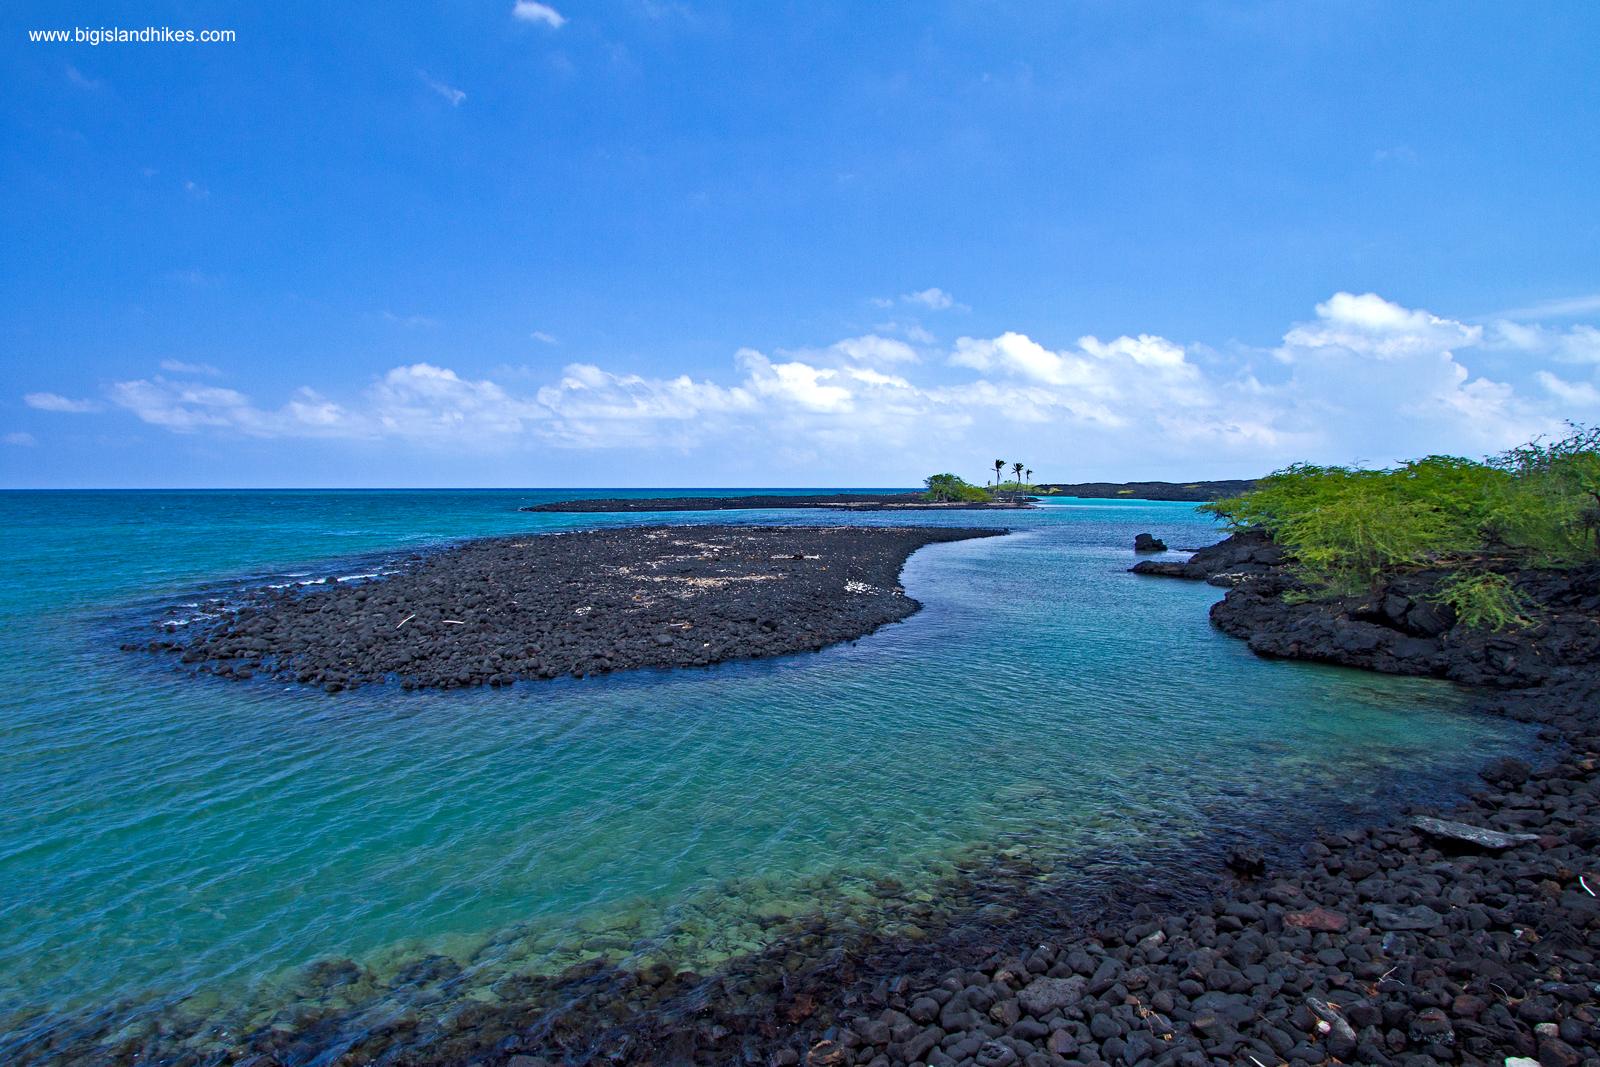 Wainanali'i lagoon